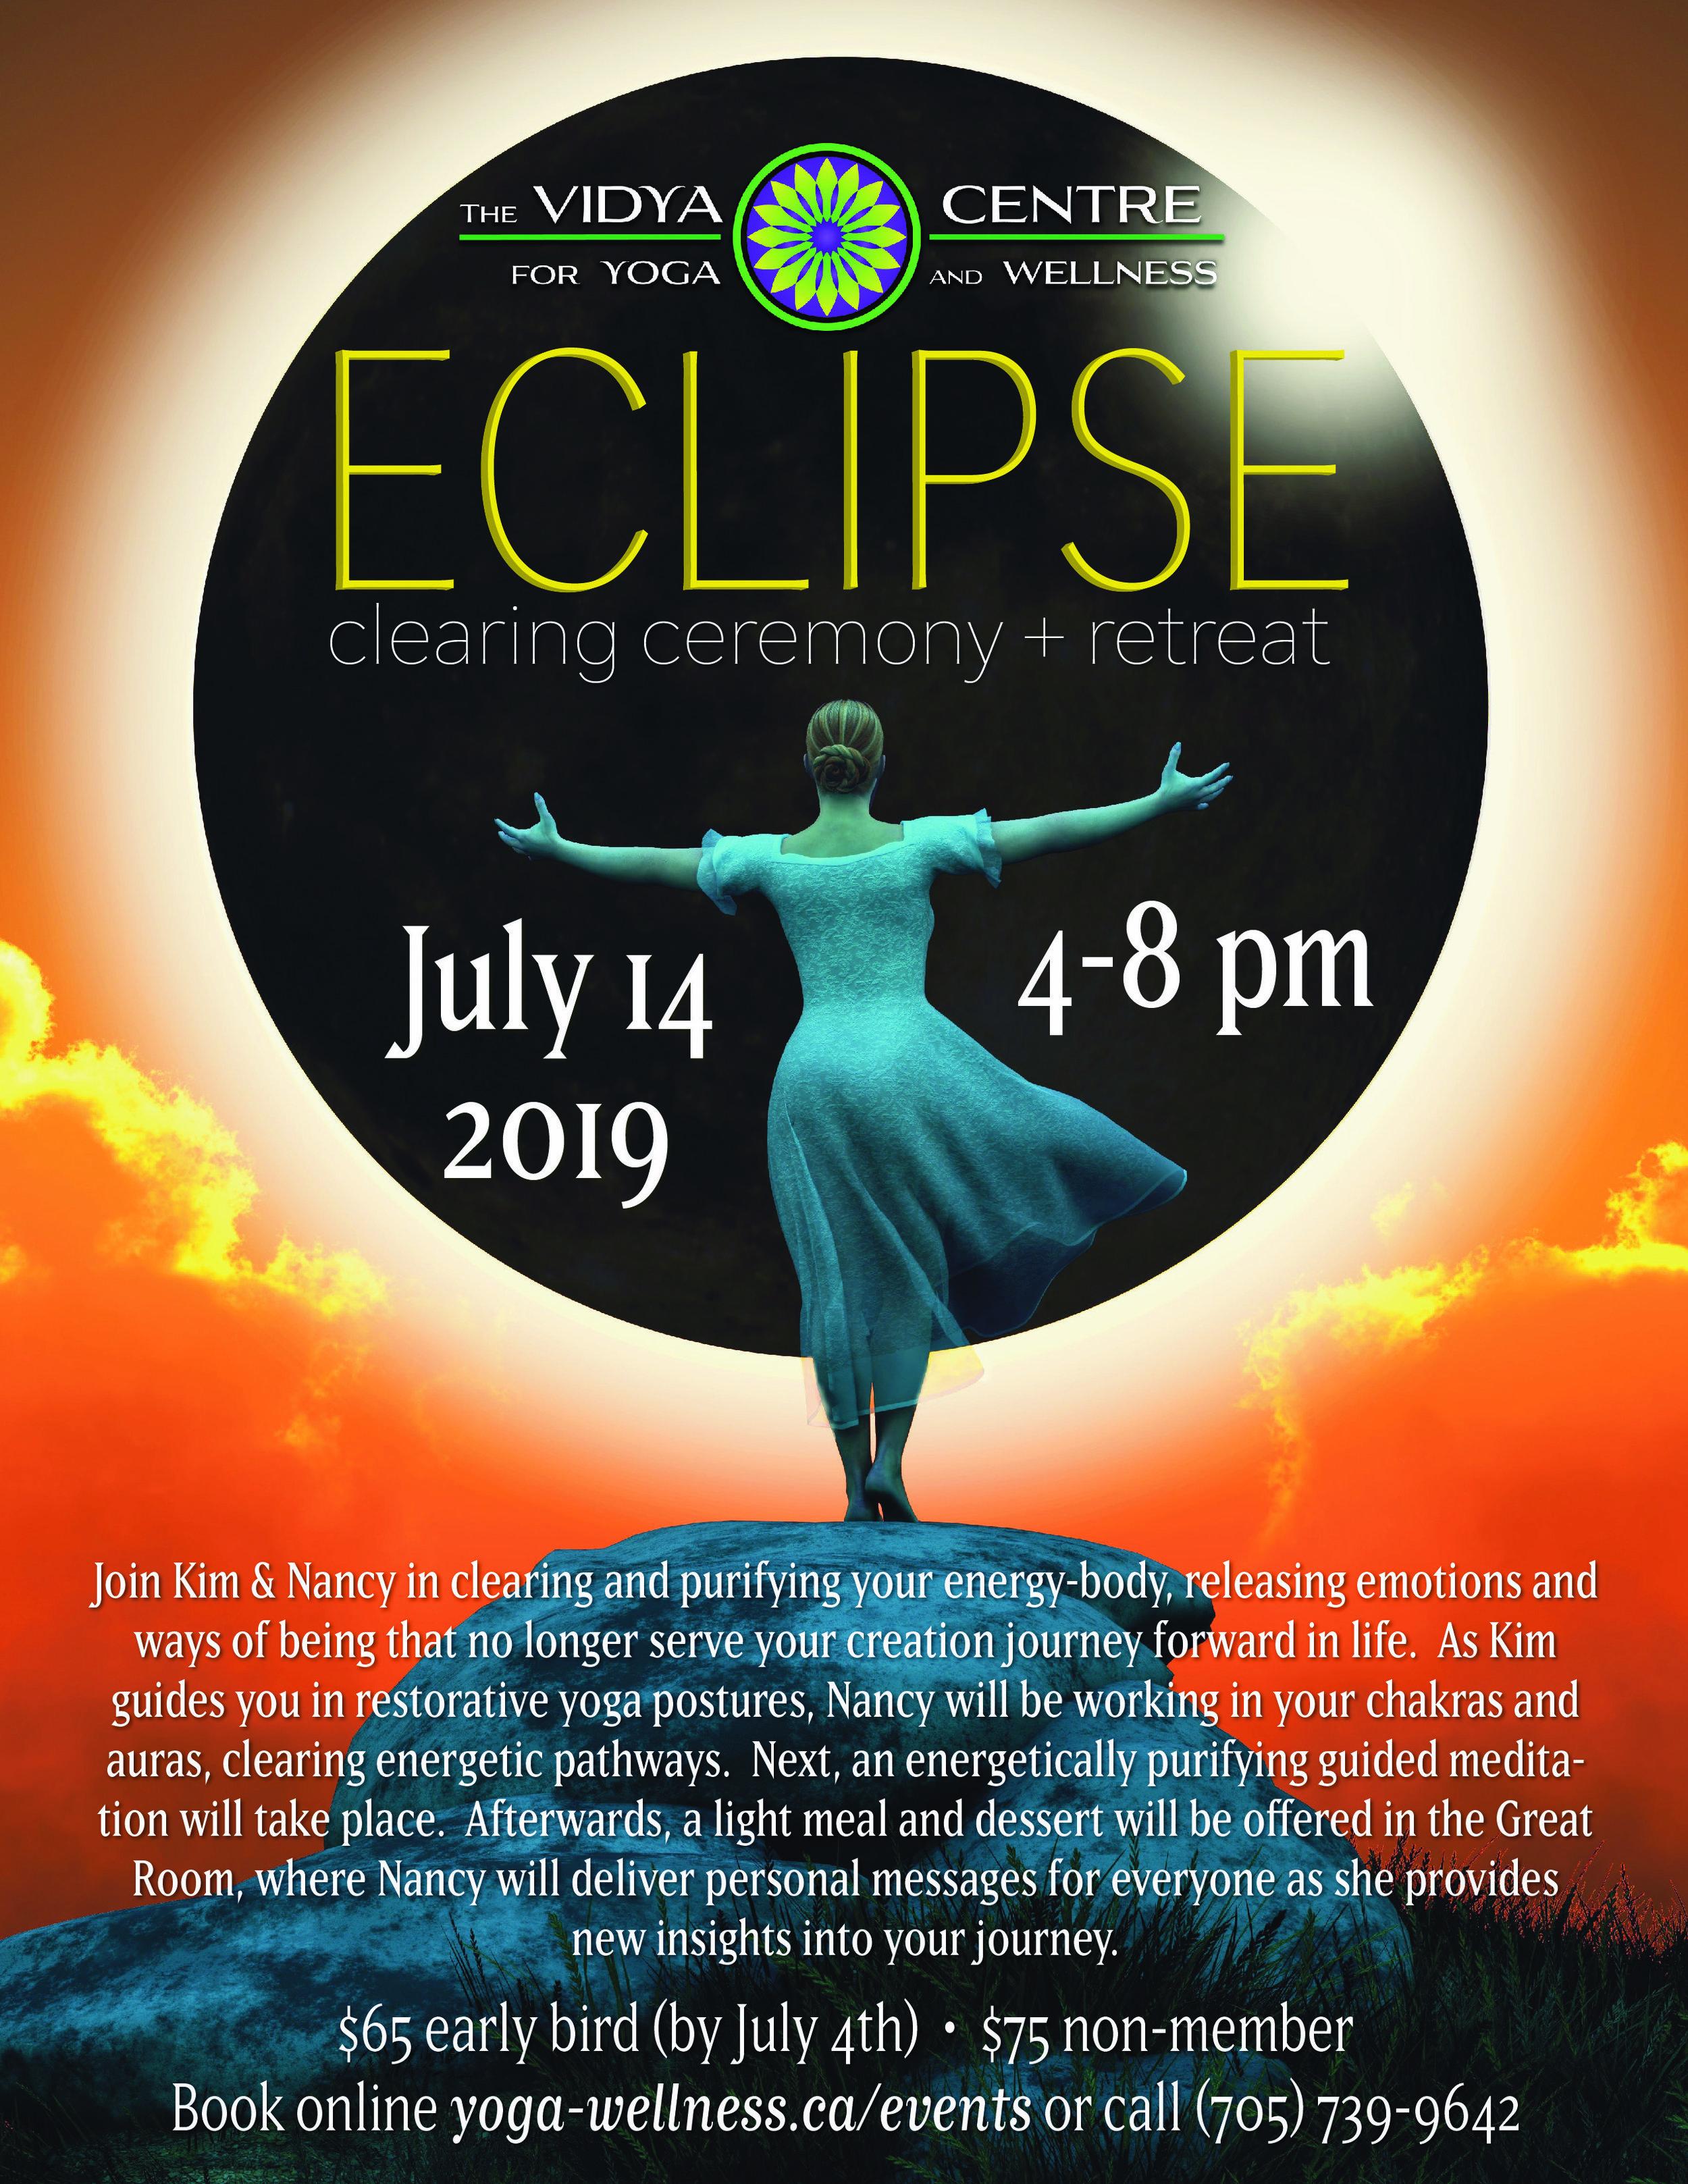 Day retreat with psychic astrologer Nancy Arruda and Yoga Teacher Kim Vidya